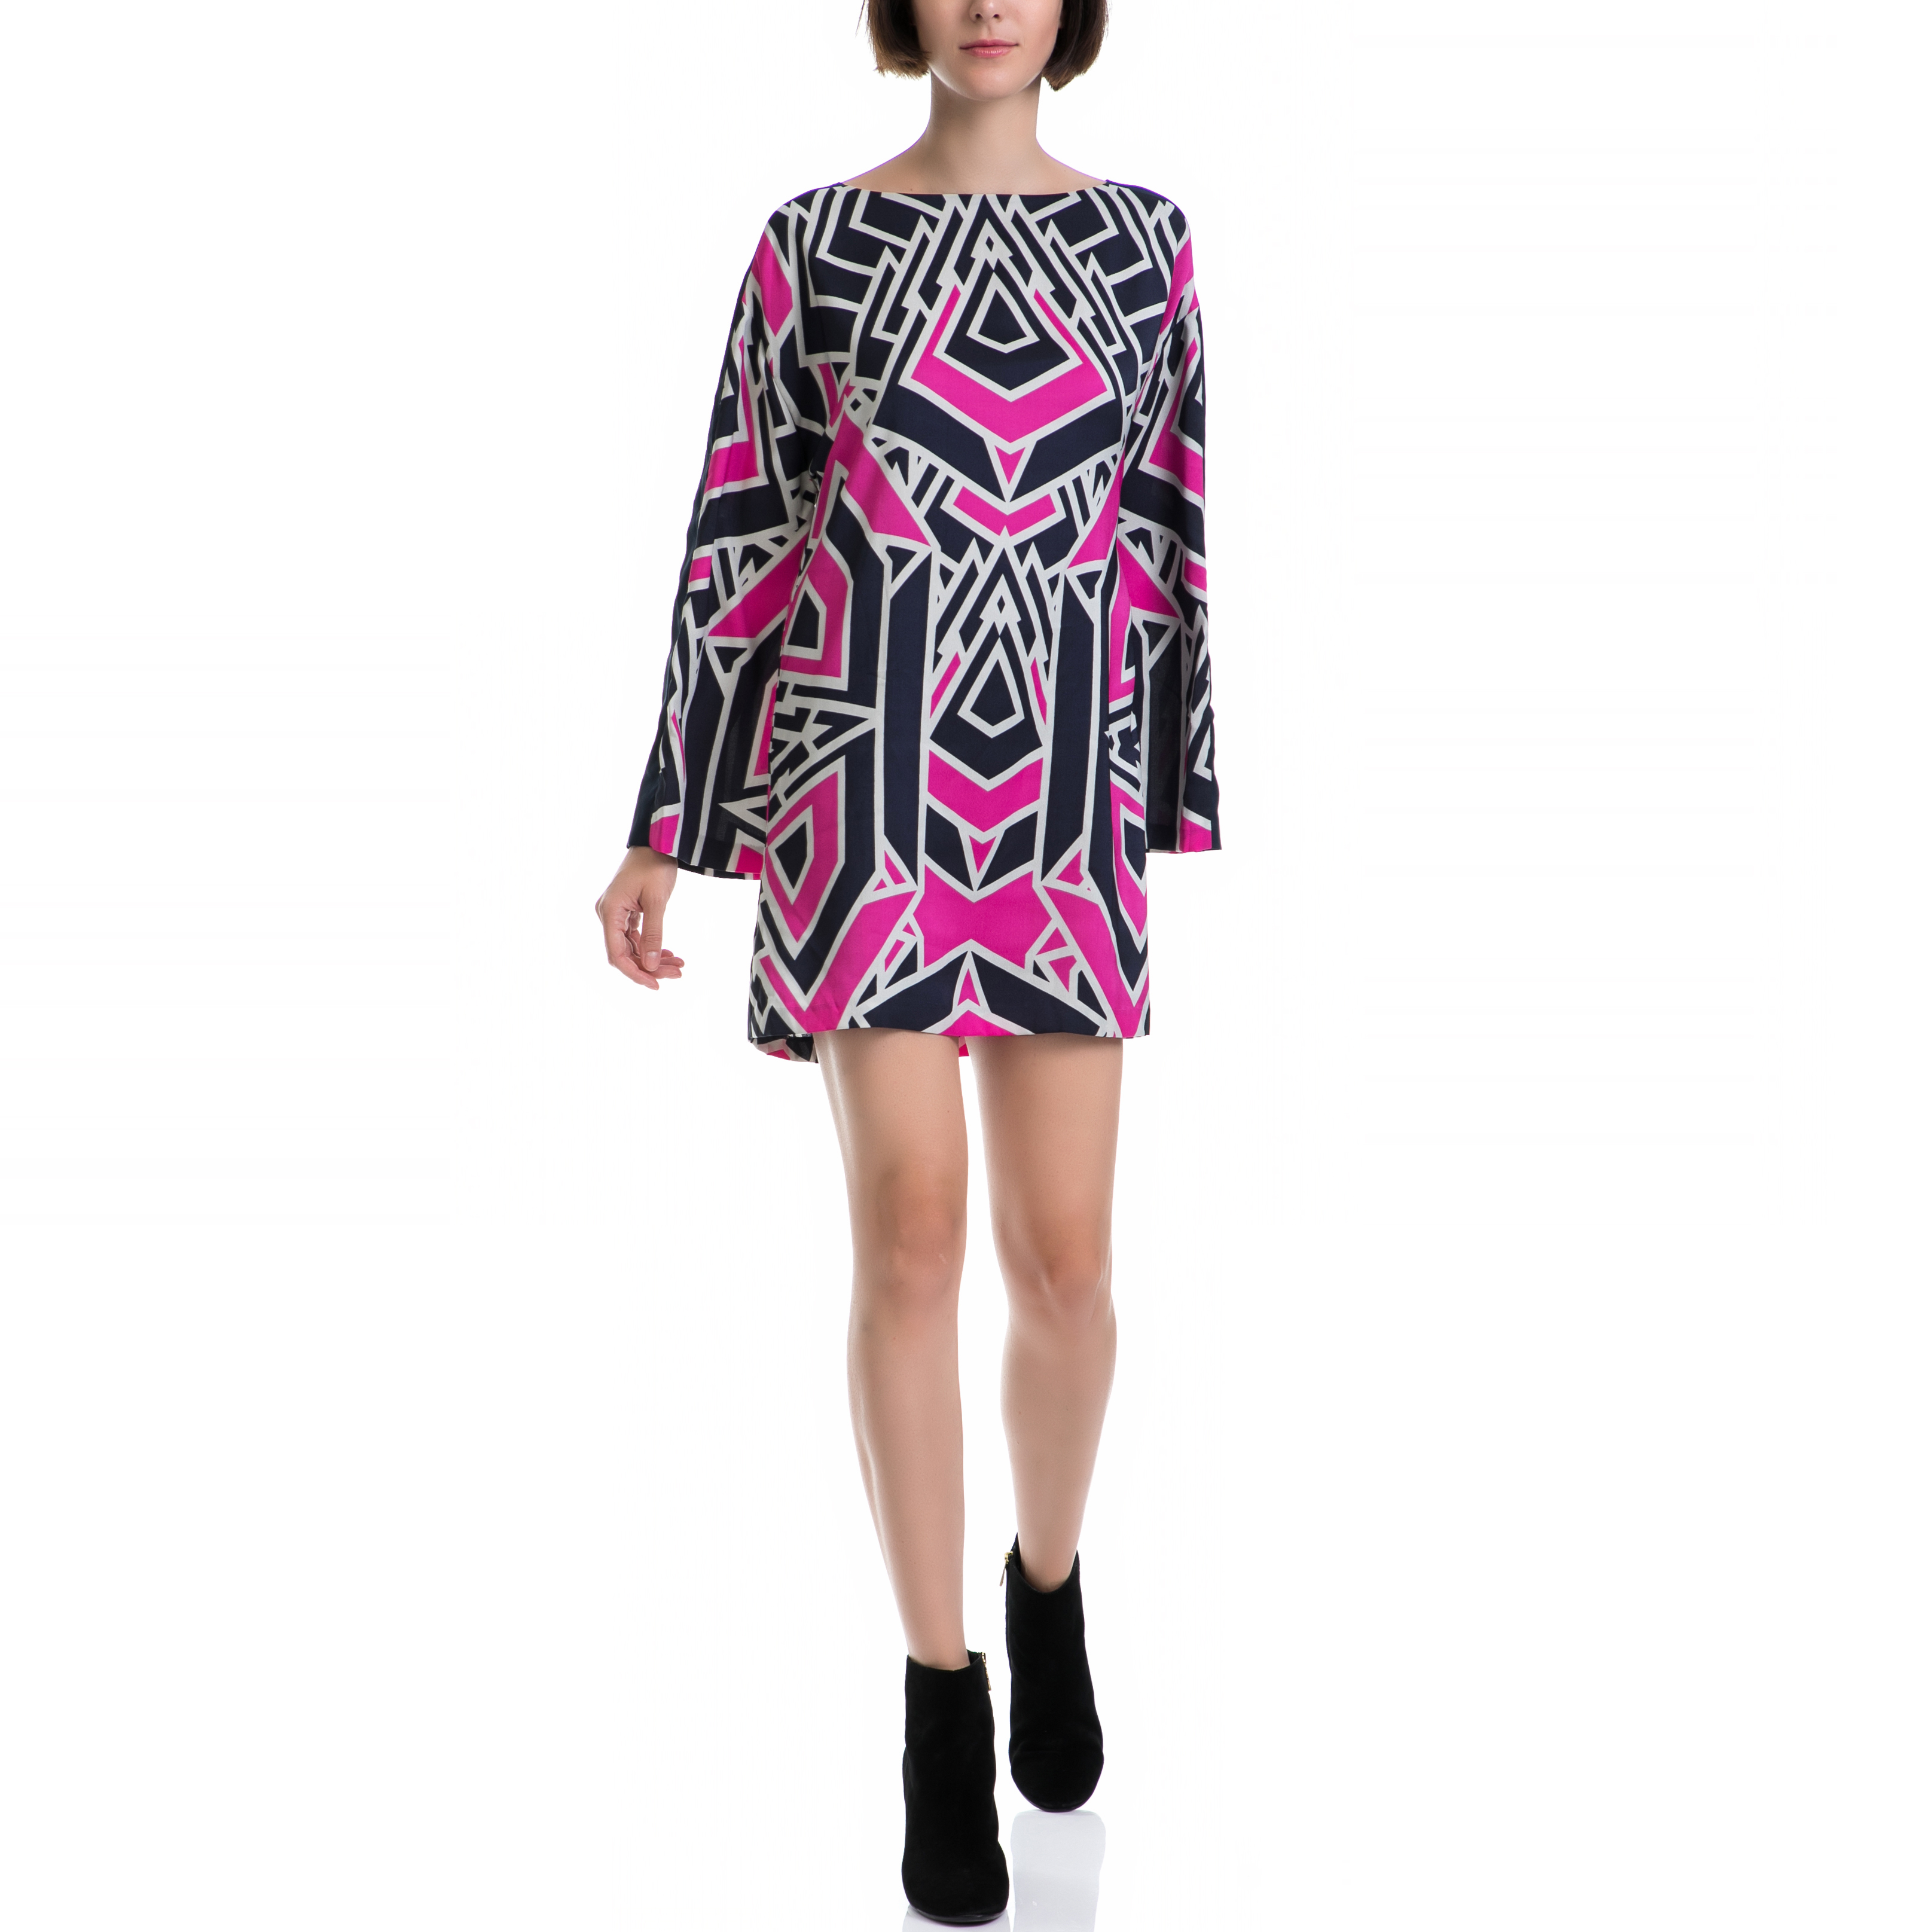 JUICY COUTURE – Γυναικείο φόρεμα JUICY COUTURE μαύρο-ροζ 57294b73718